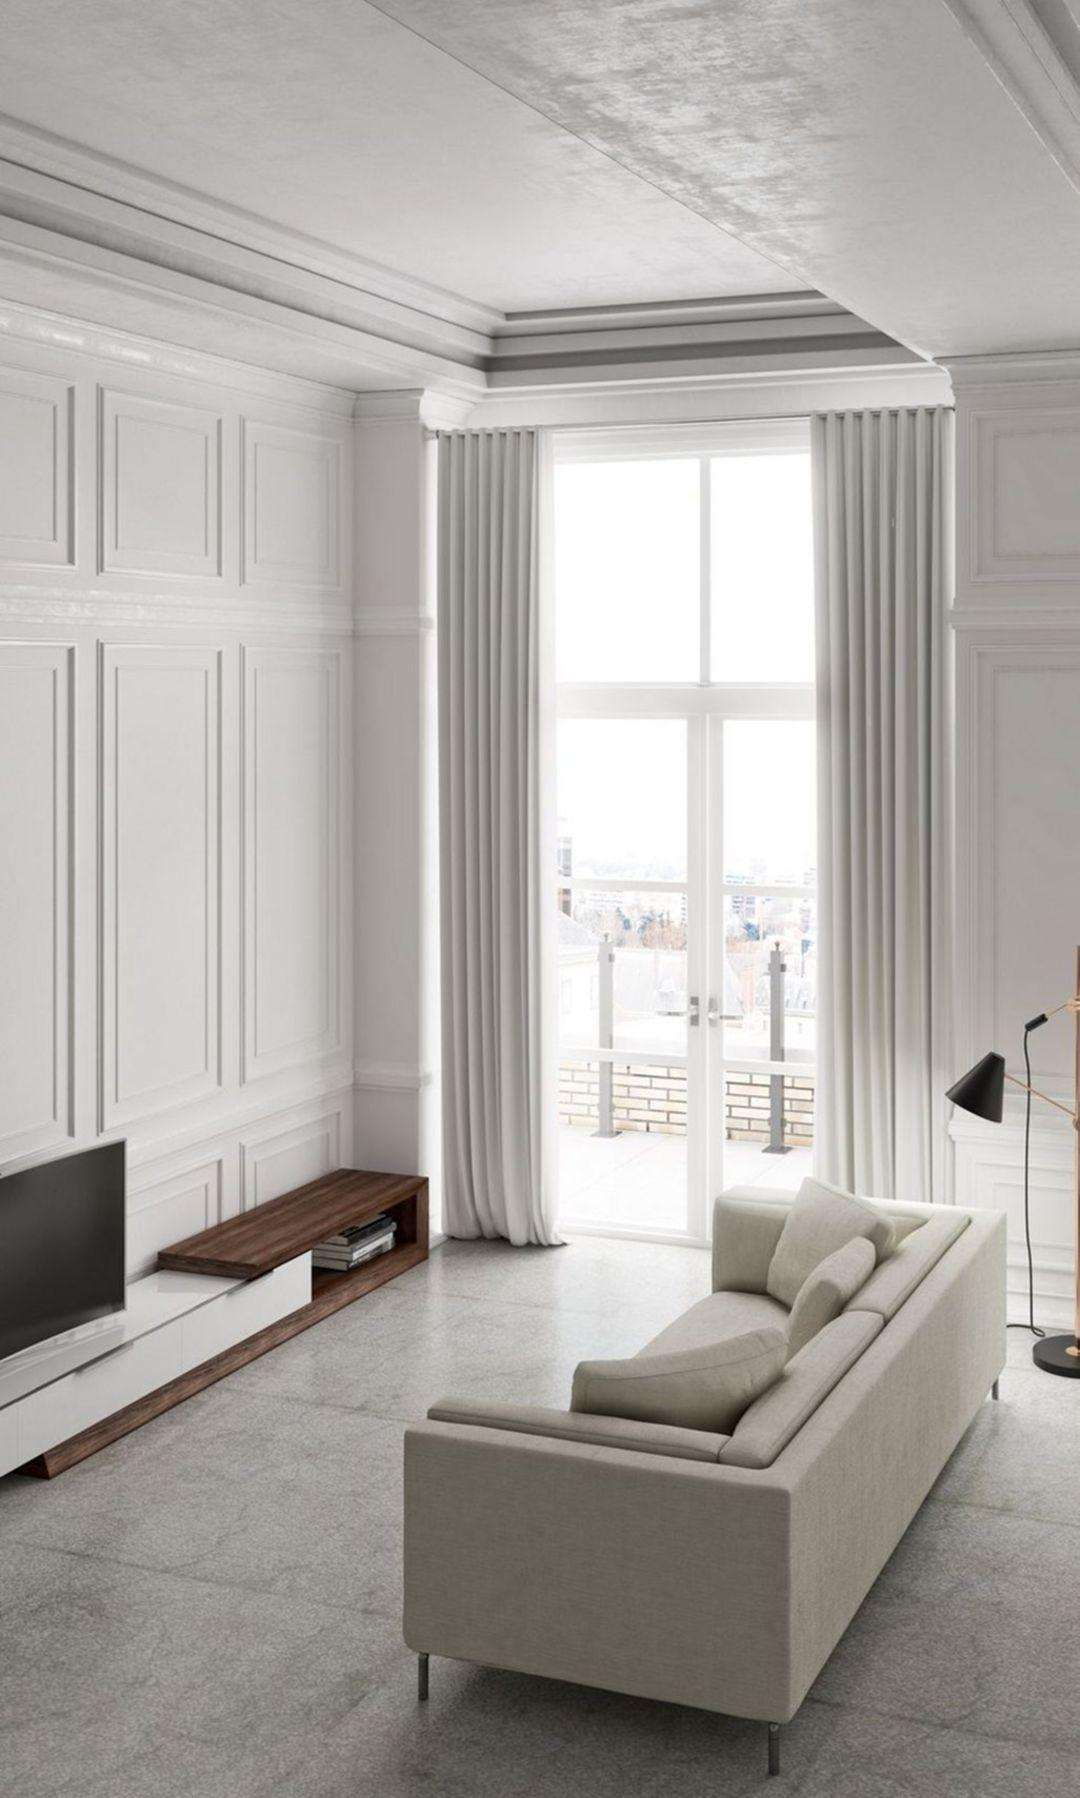 Modern Minimalist Living Room Design: 25+ Elegant Minimalist Living Room Ideas For The Comfort